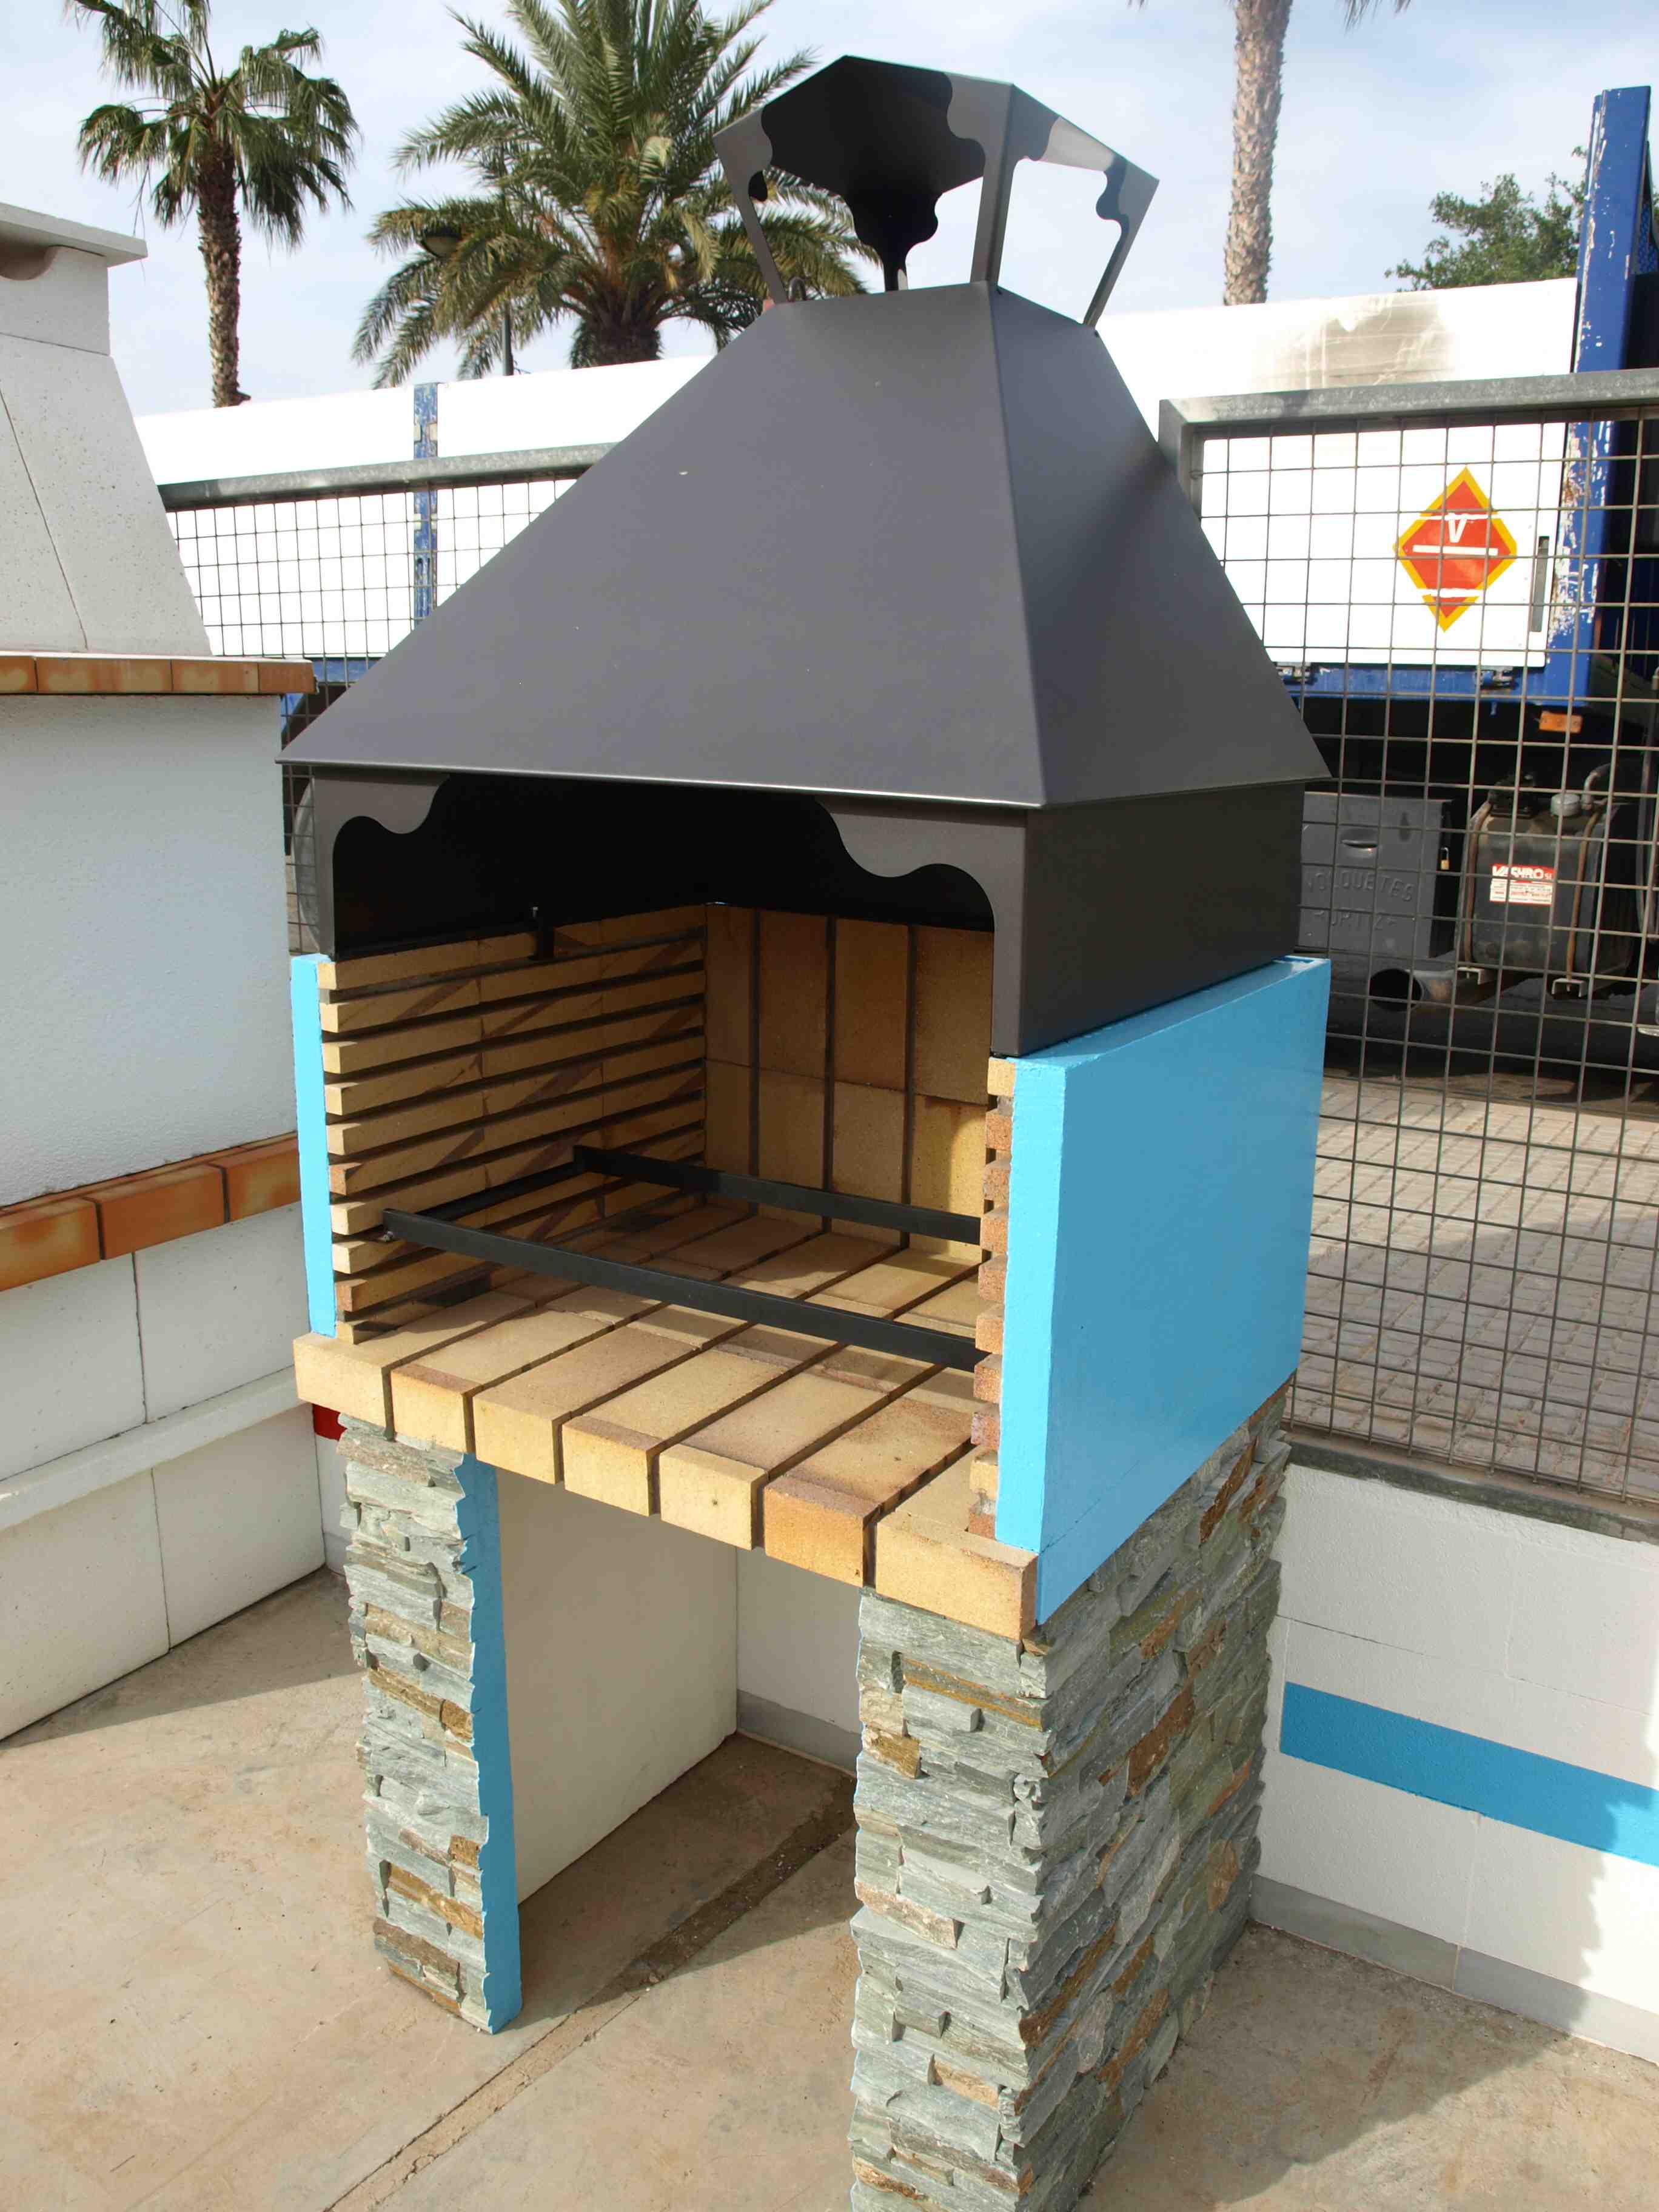 Personalizar un paellero barbacoa chimeneas s nchez - Barbacoas de piedra natural ...